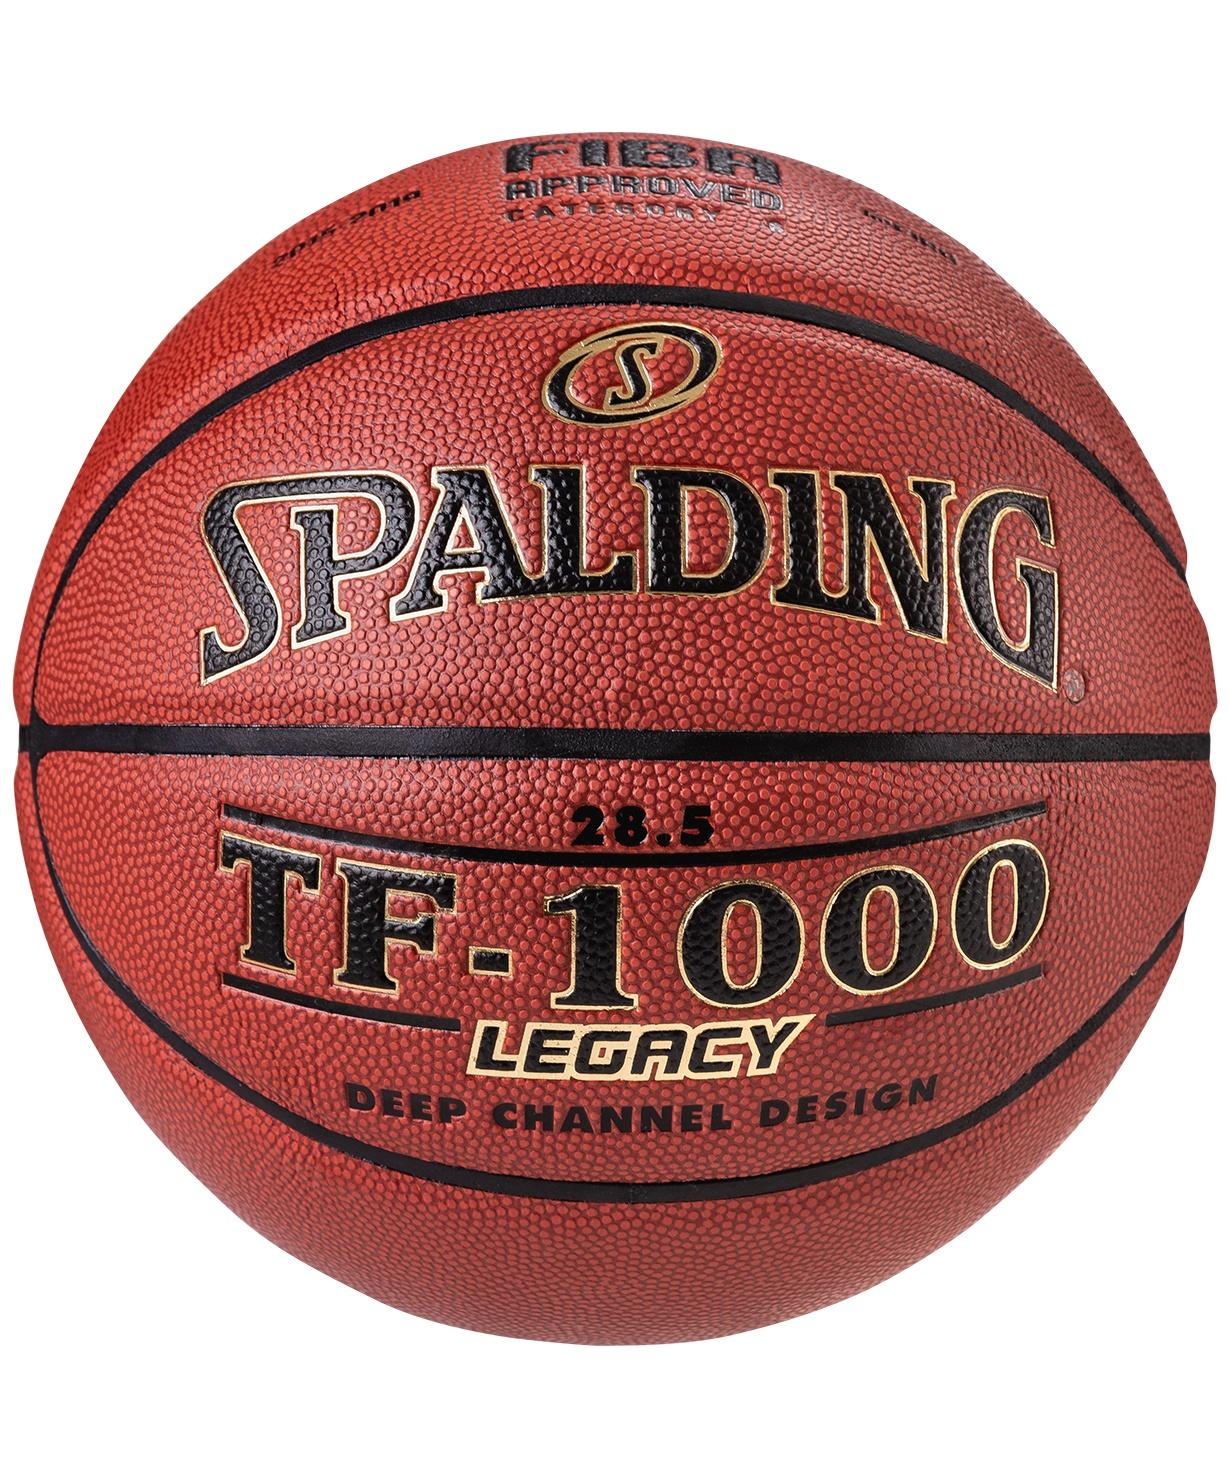 все цены на Мяч баскетбольный Spalding TF-1000 Legacy, Размер 6 онлайн